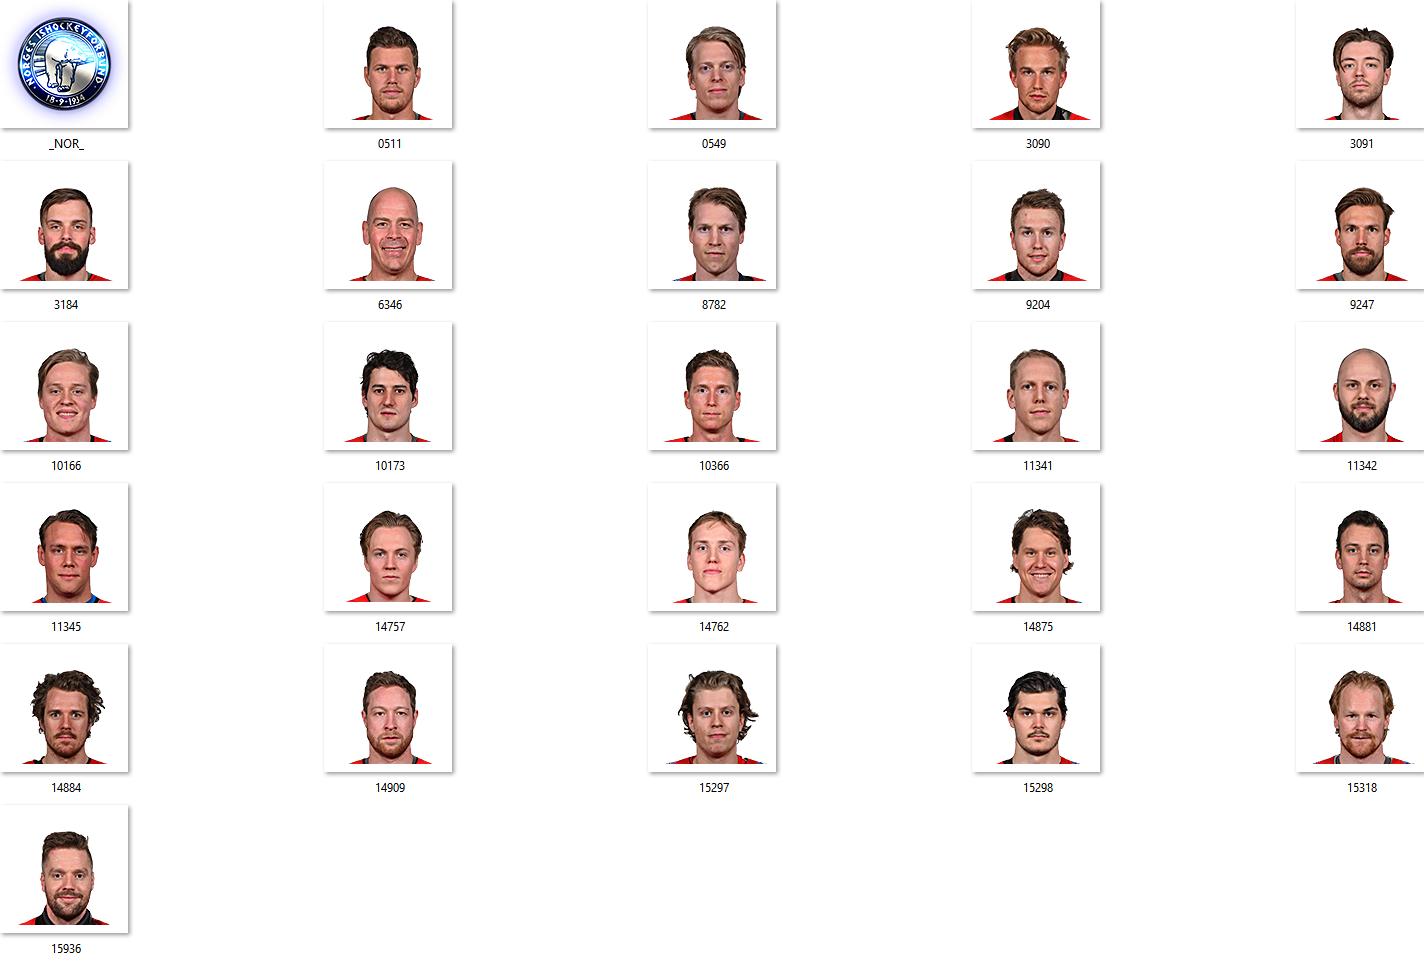 IIHF 2018 NOR Facepack